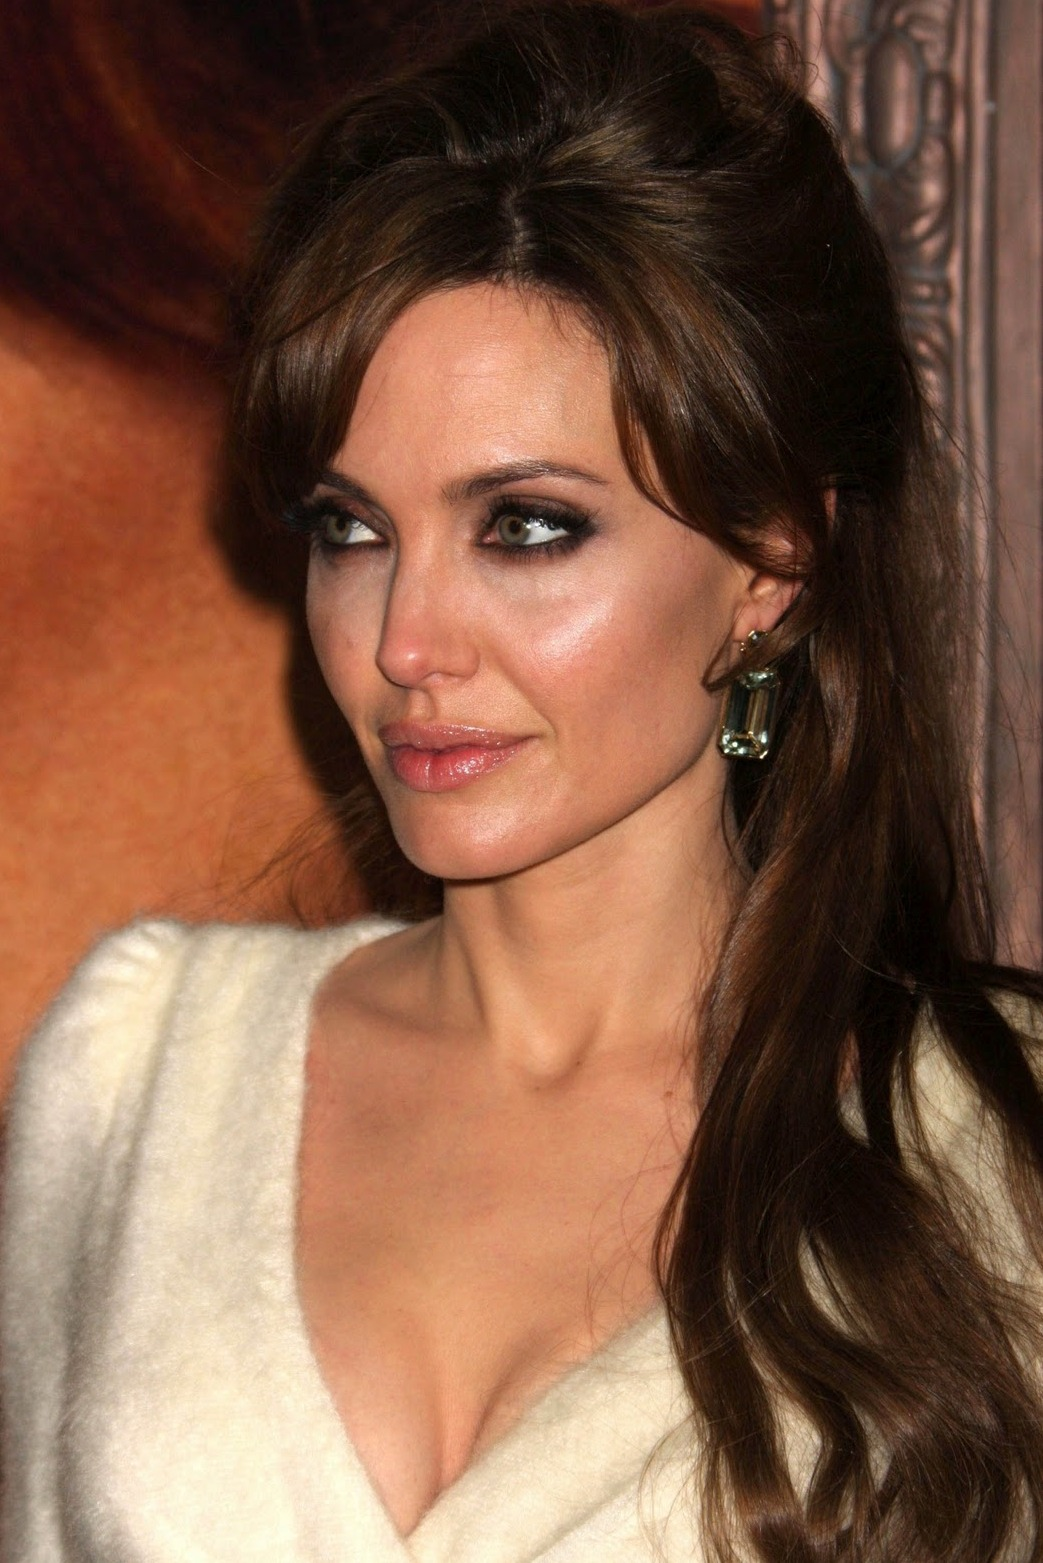 http://2.bp.blogspot.com/_LVSBSw6oemI/TTqEib24X-I/AAAAAAAAD2c/7Wch9B1XpeA/s1600/Angelina_Jolie_Latest_Cool_00.jpg